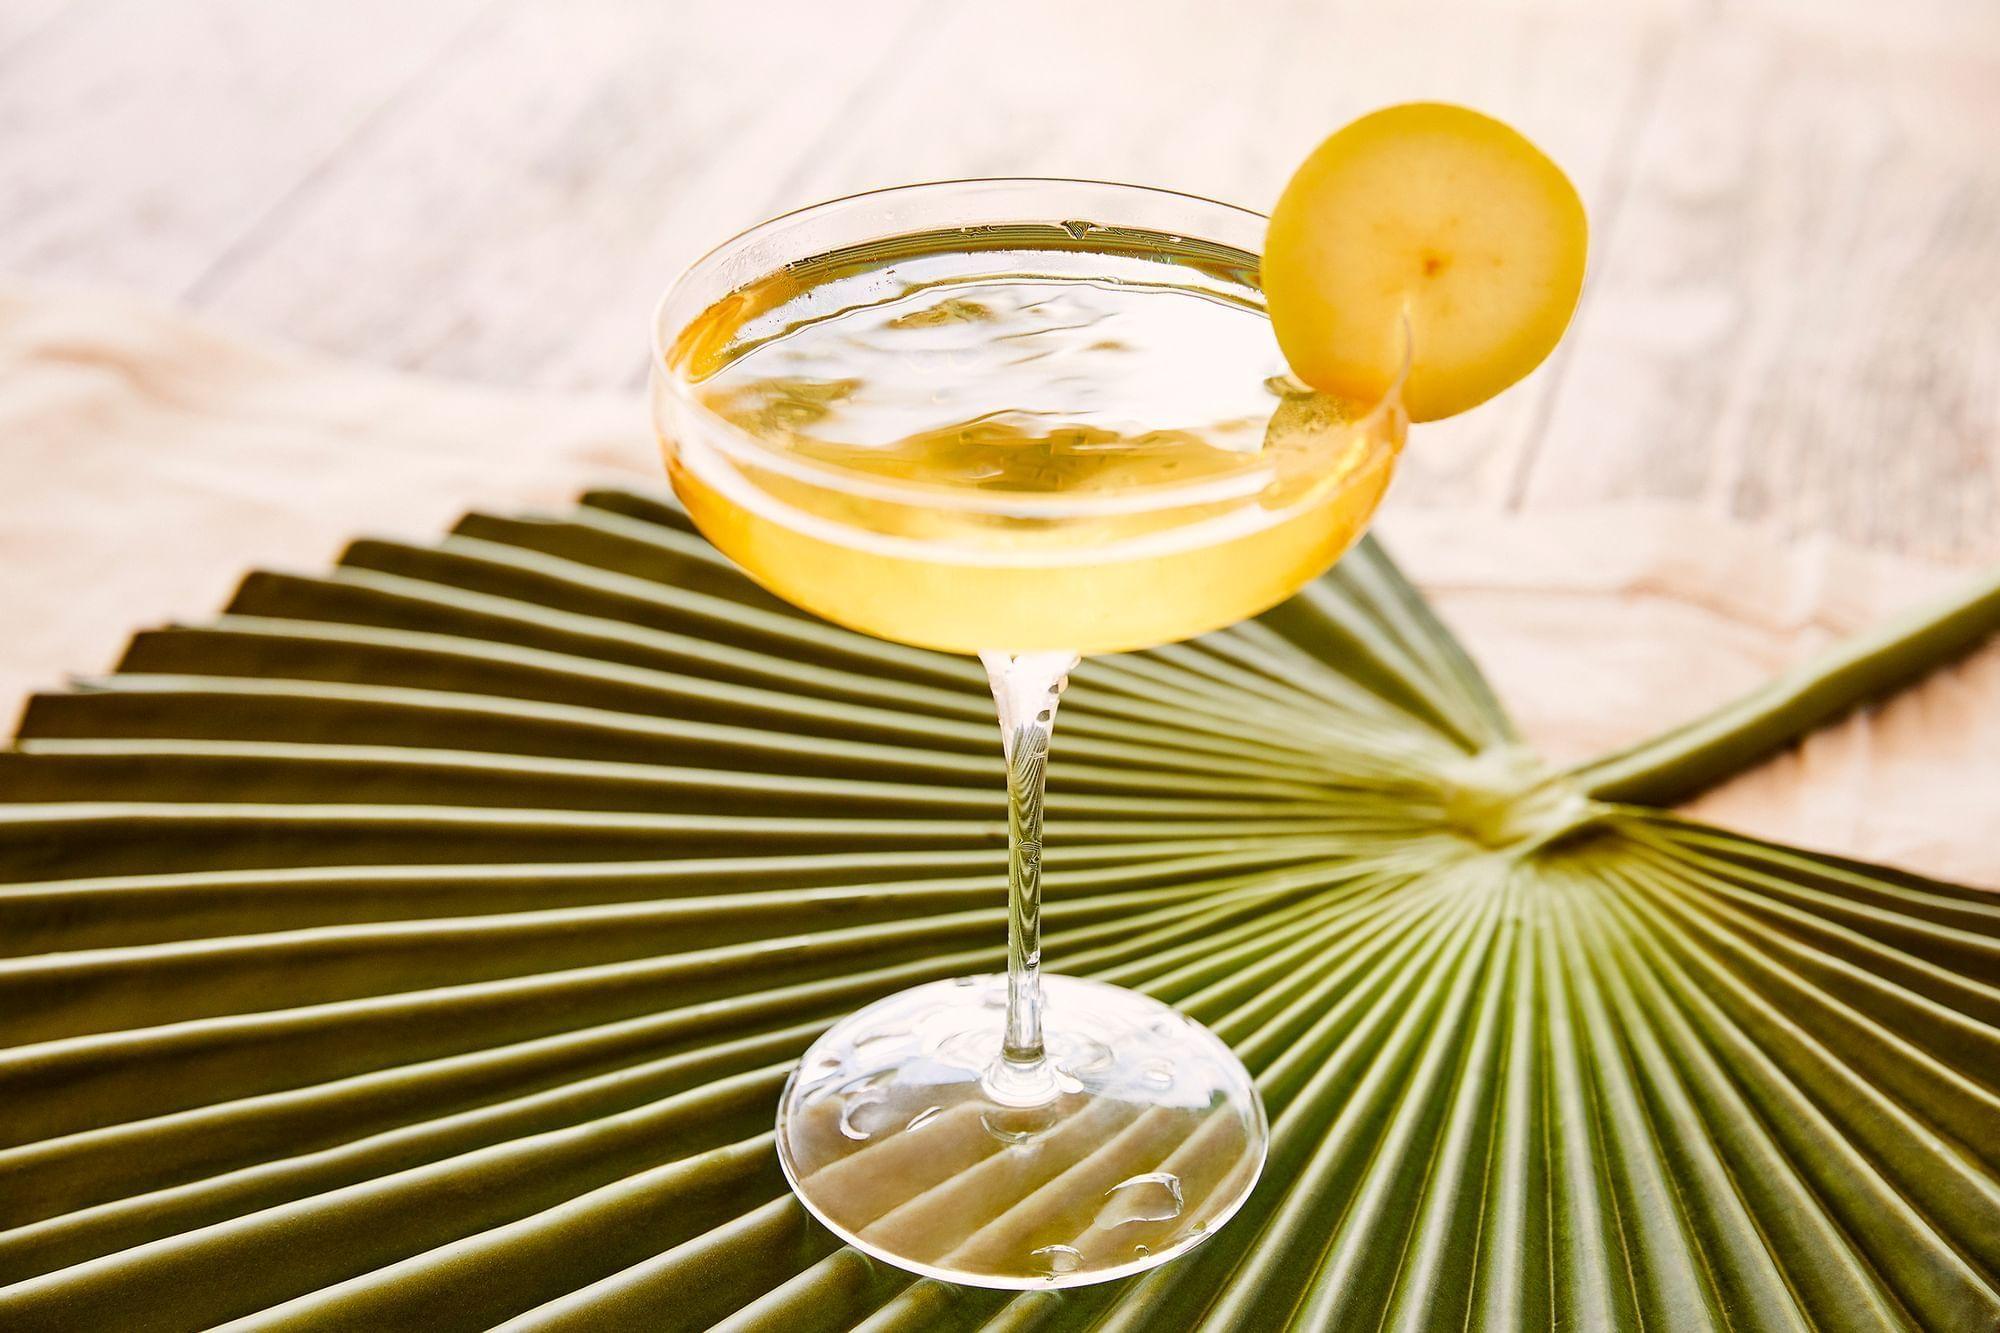 Cocktail drink on palm leaf at Daydream Island Resort